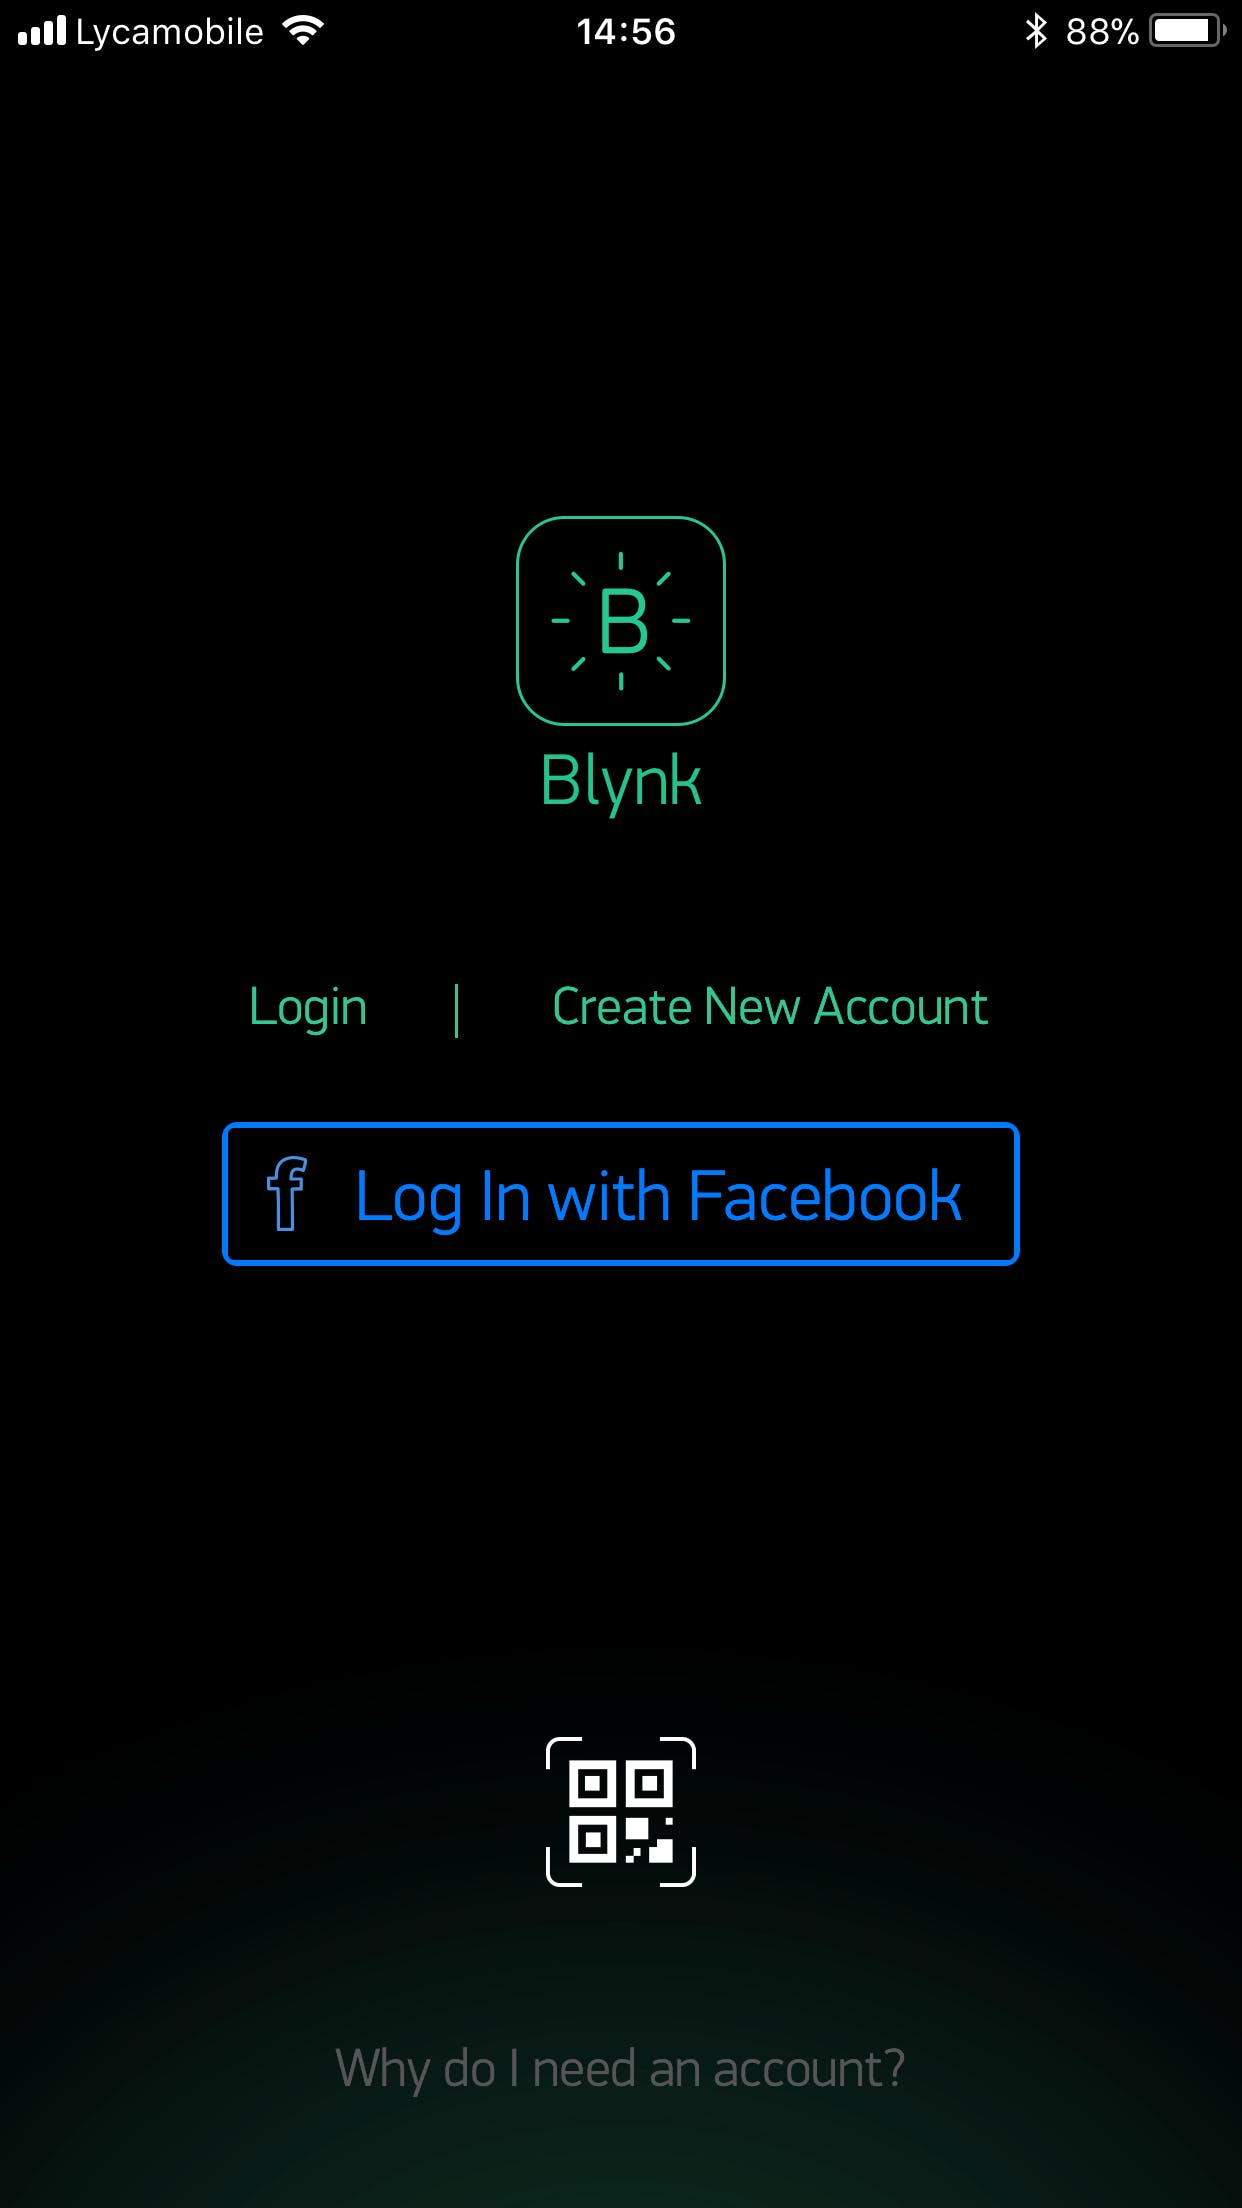 Open the Blynk App